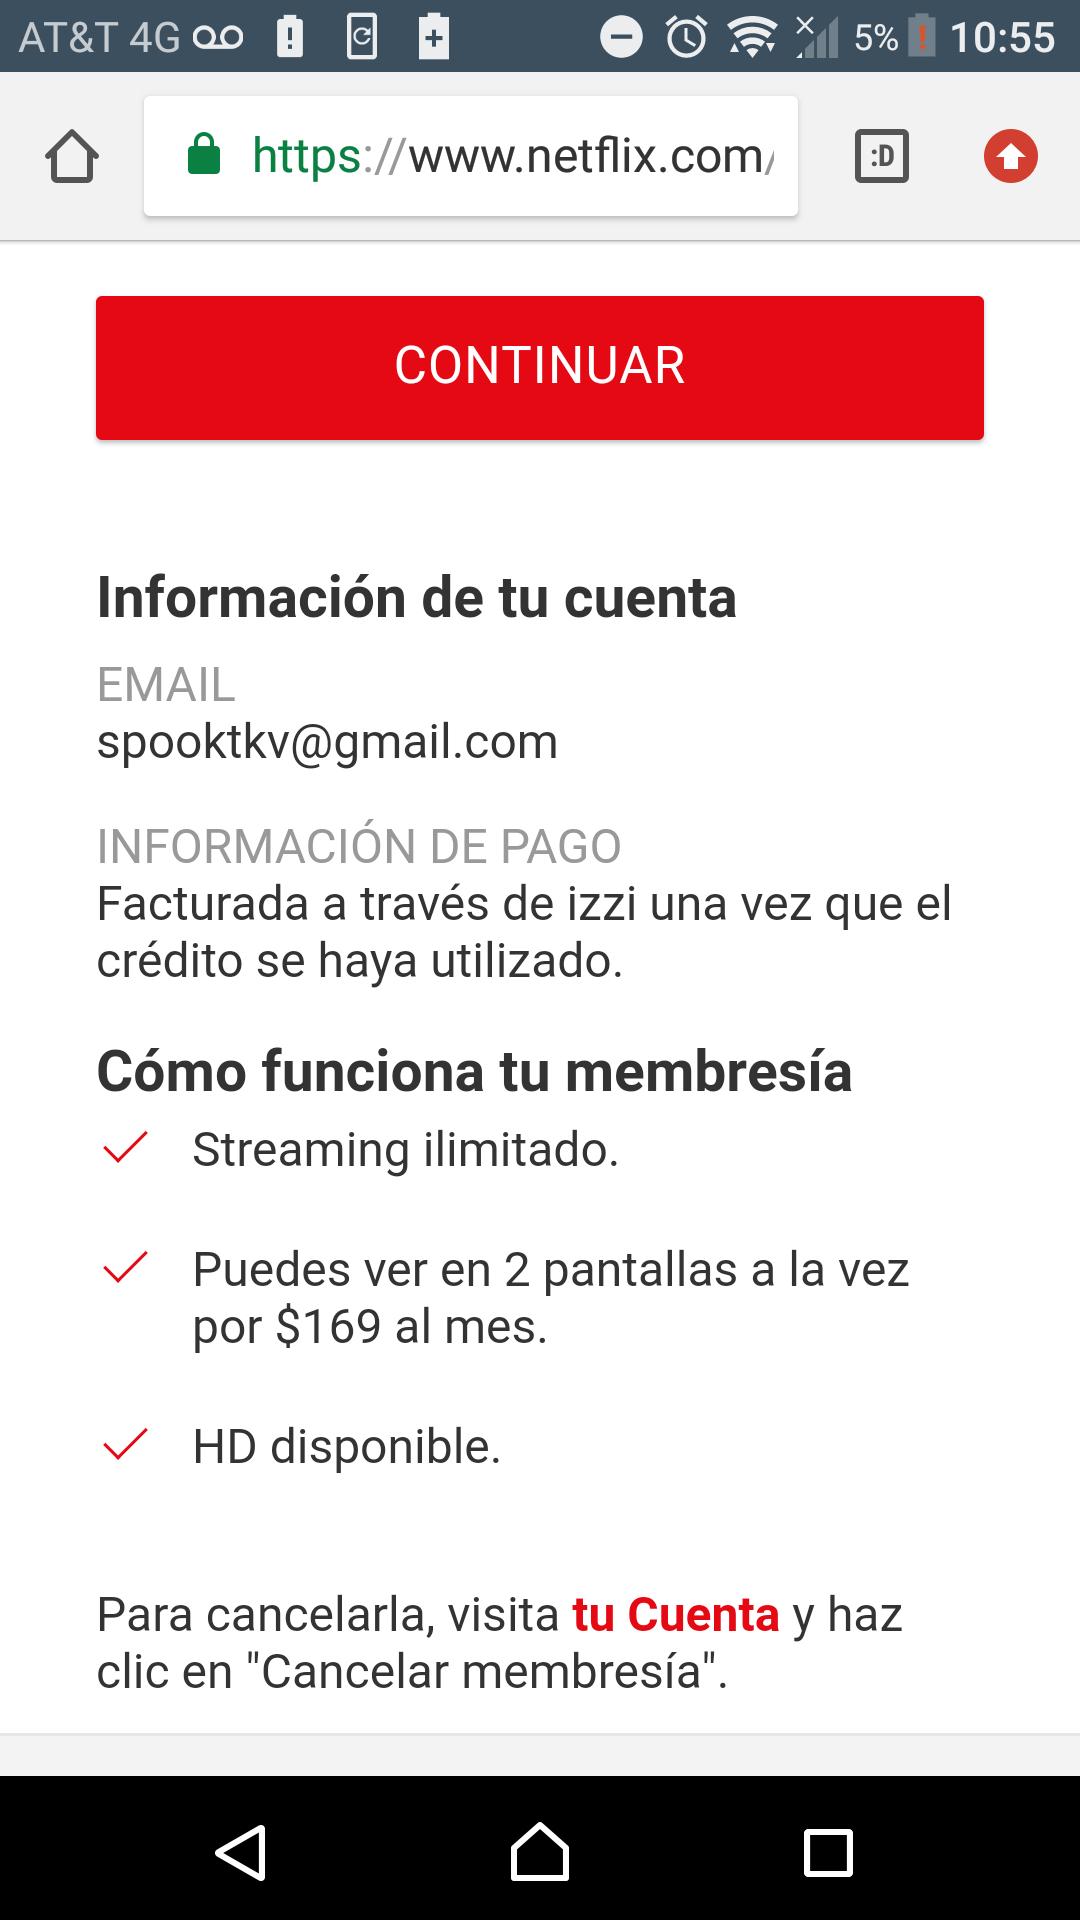 Netflix gratis por 2 meses con izzi